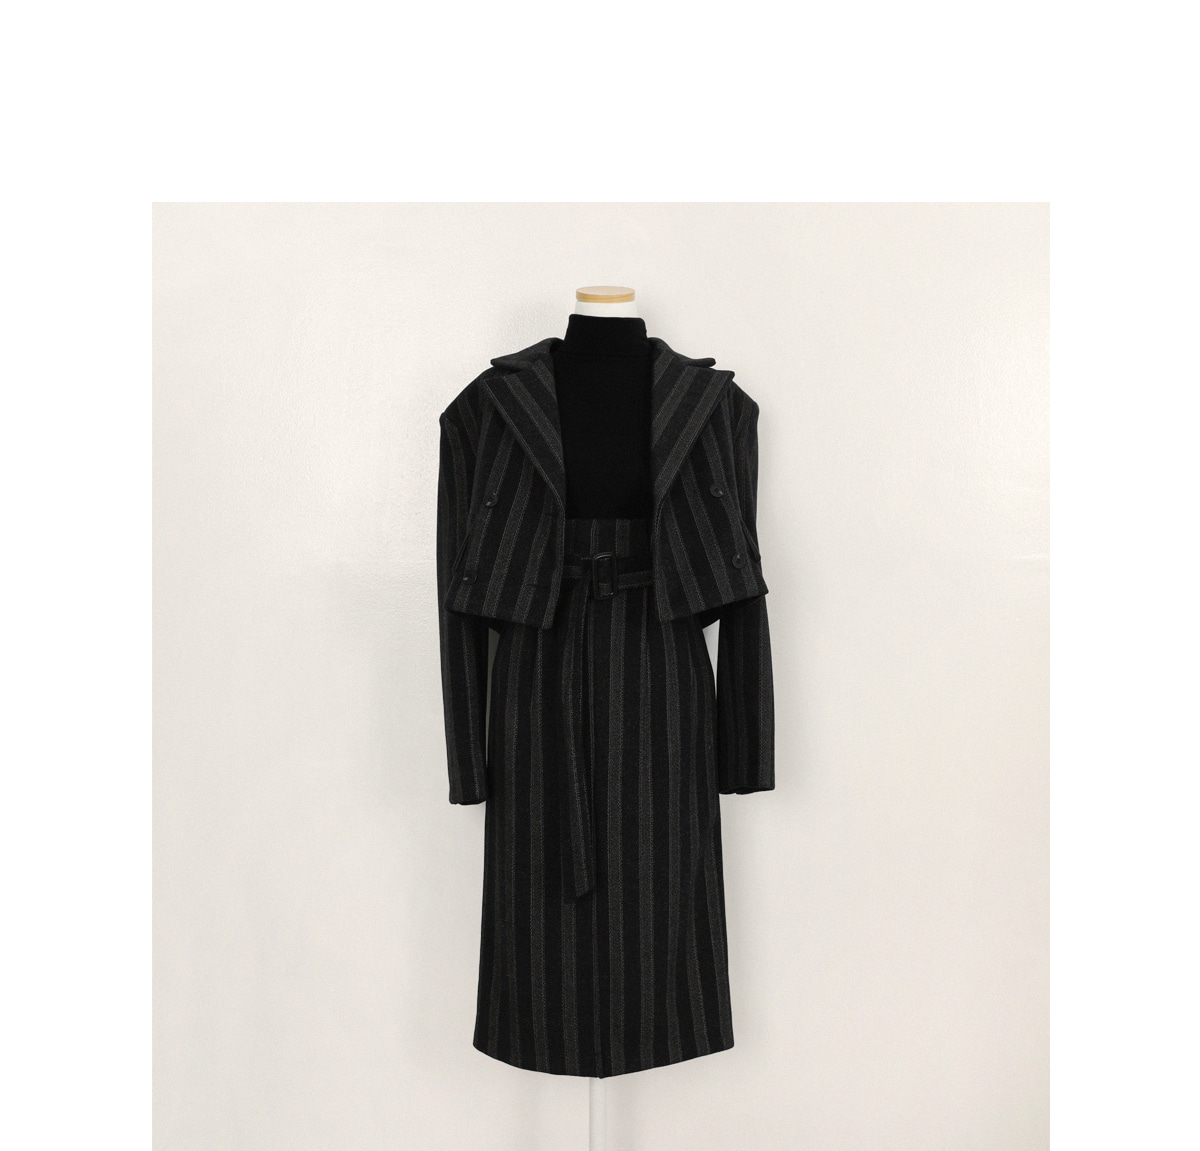 Janl ST wool skirt